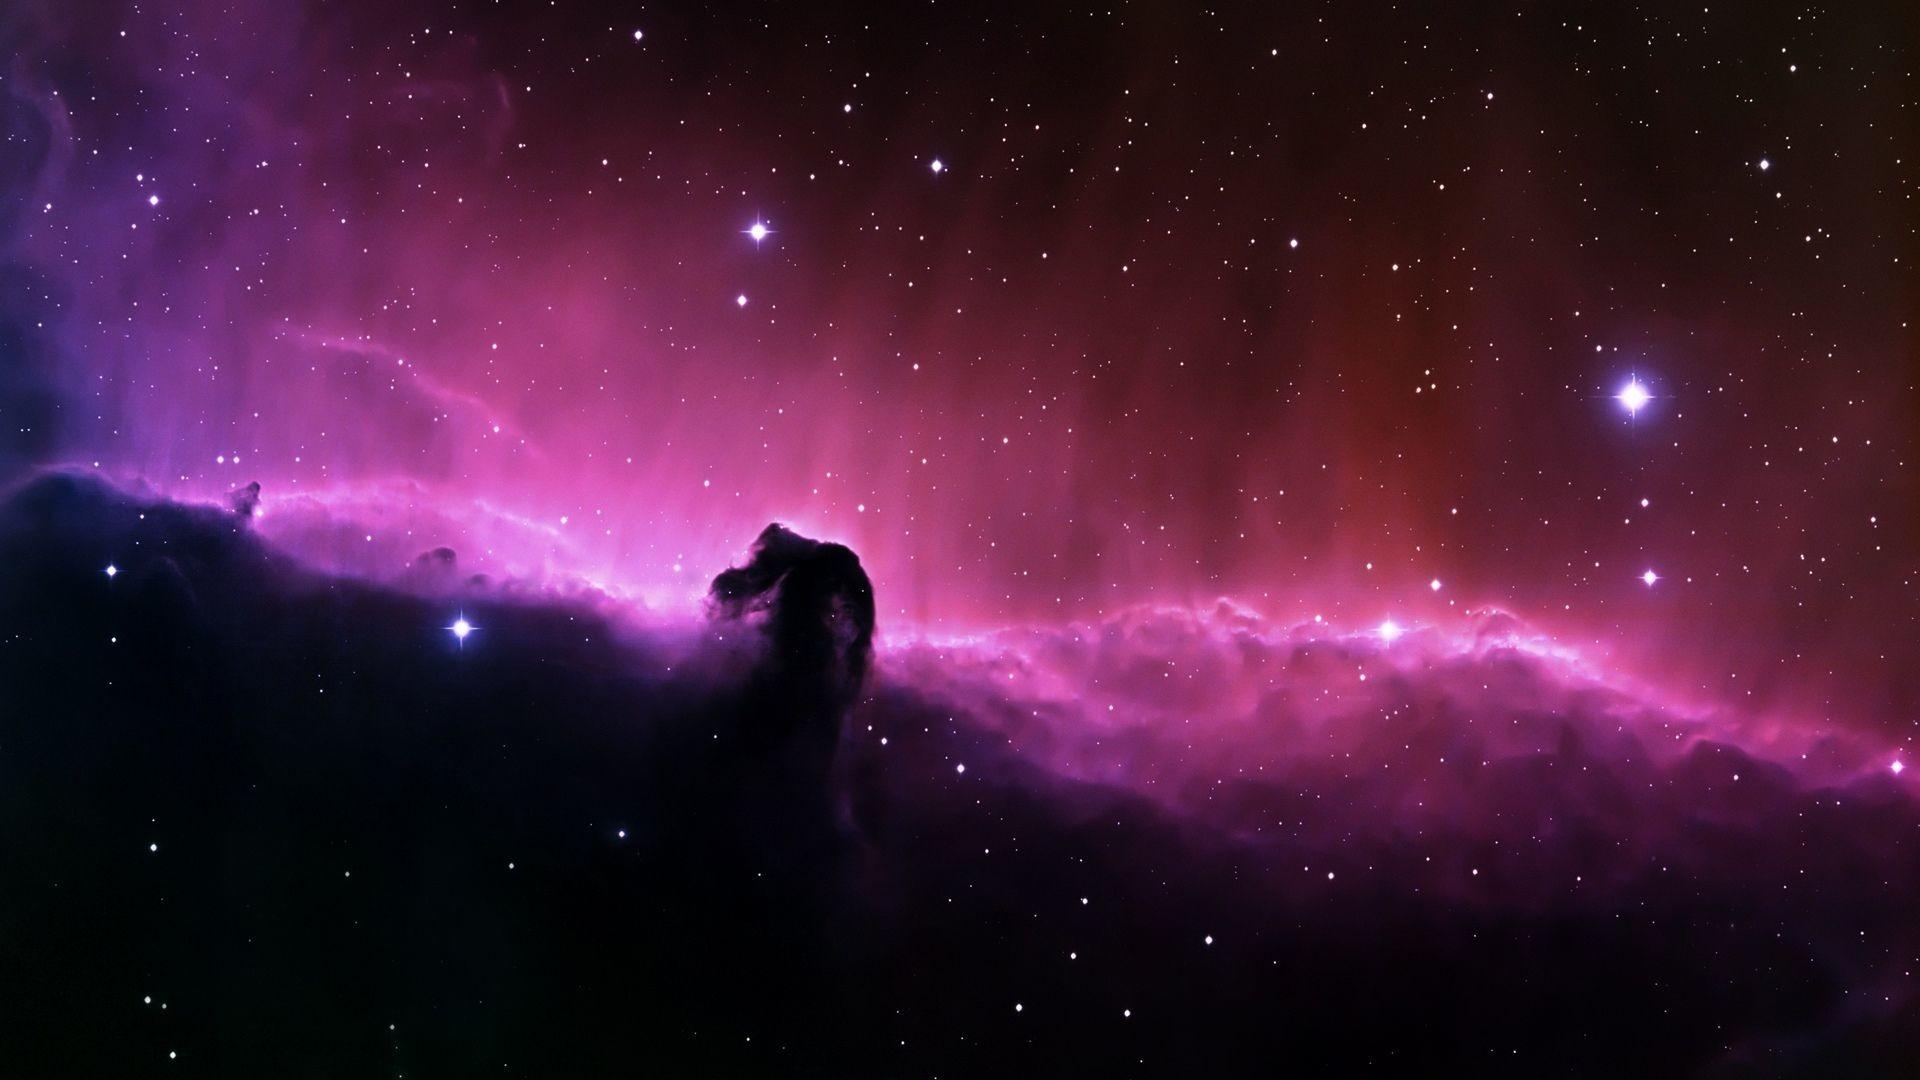 Stars, wallpaper, ps3, star, pink, horsehead (#148555)